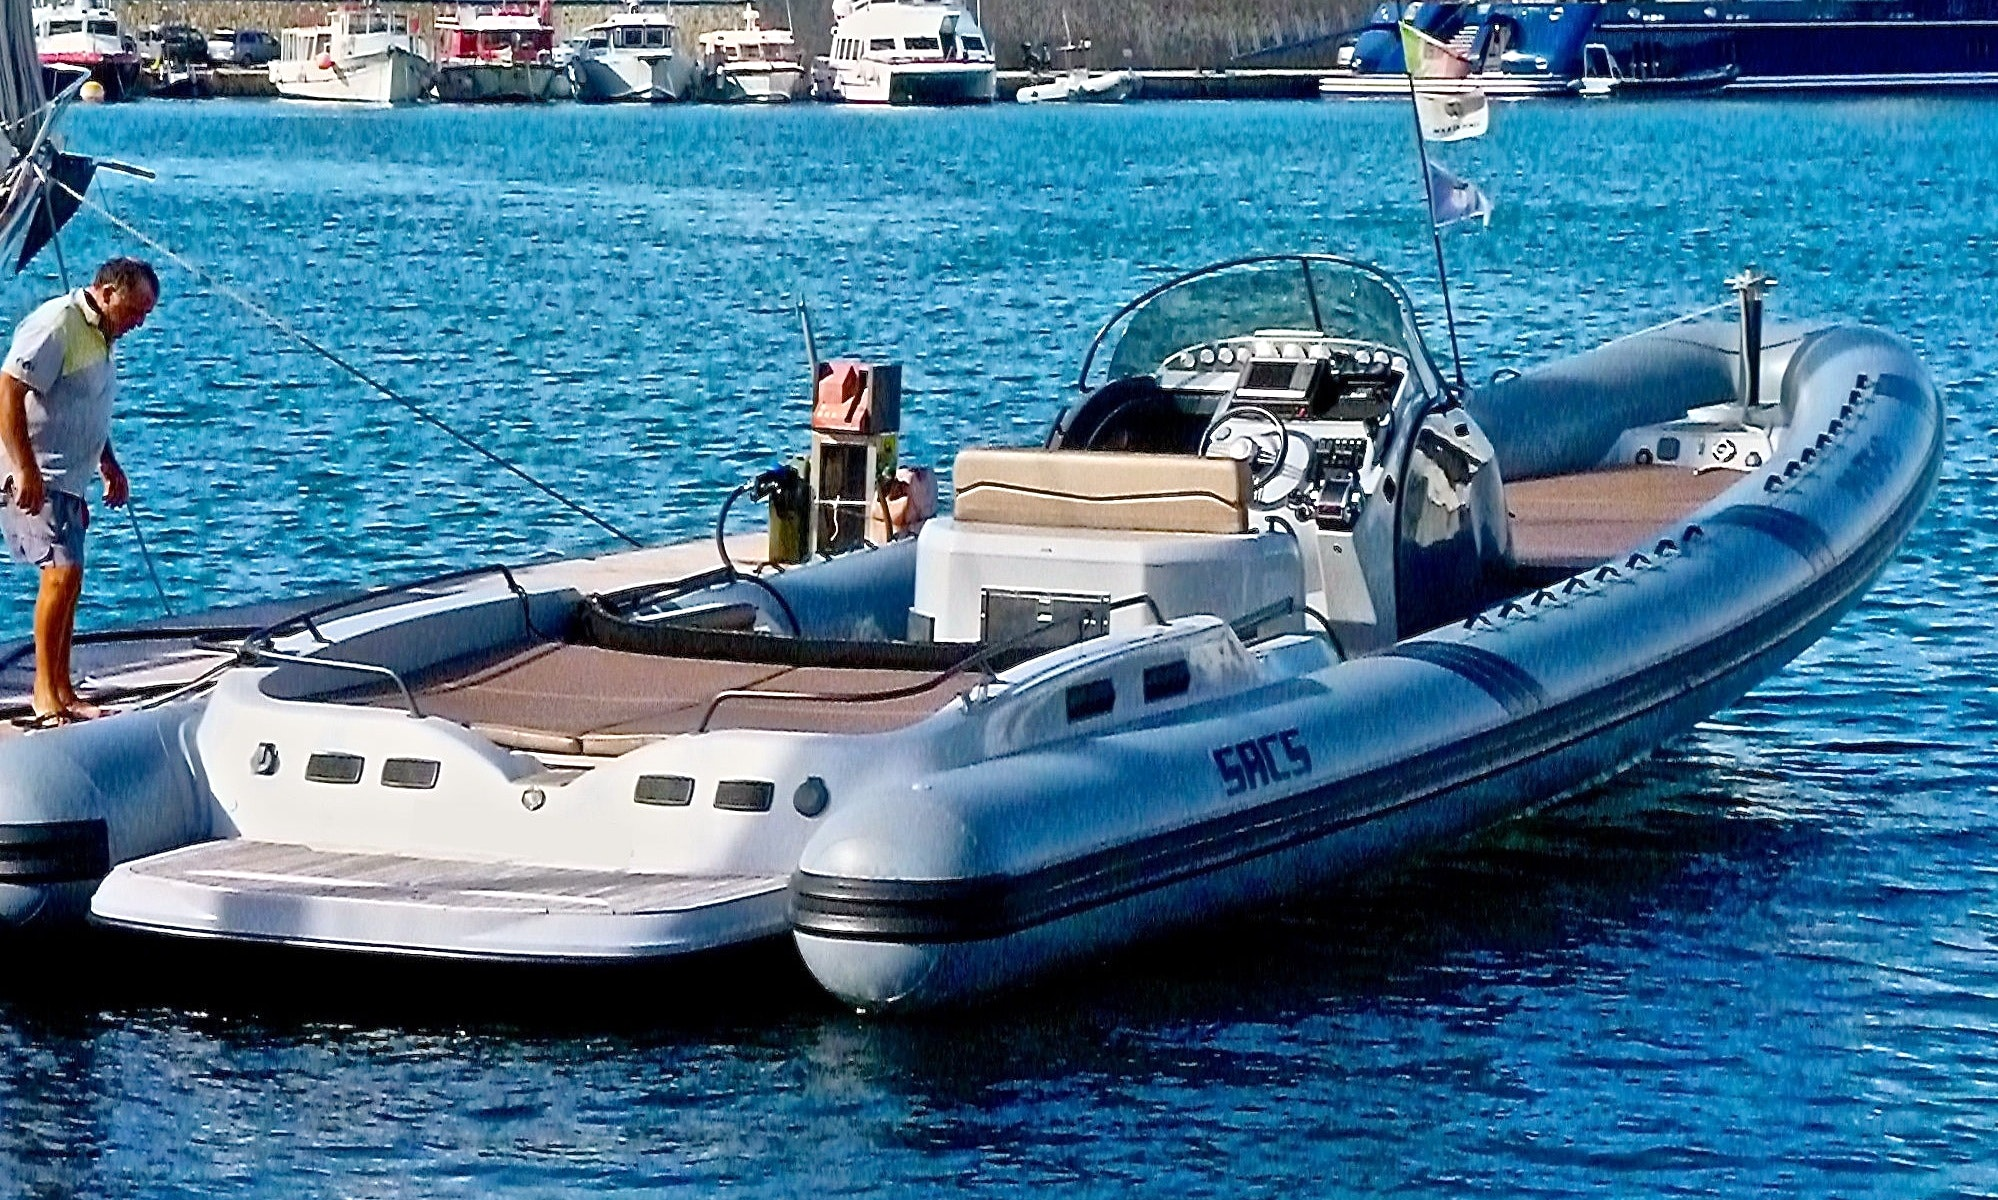 MEGA RIB BOAT, Ultimate Speed Powerboat Experience in IBIZA